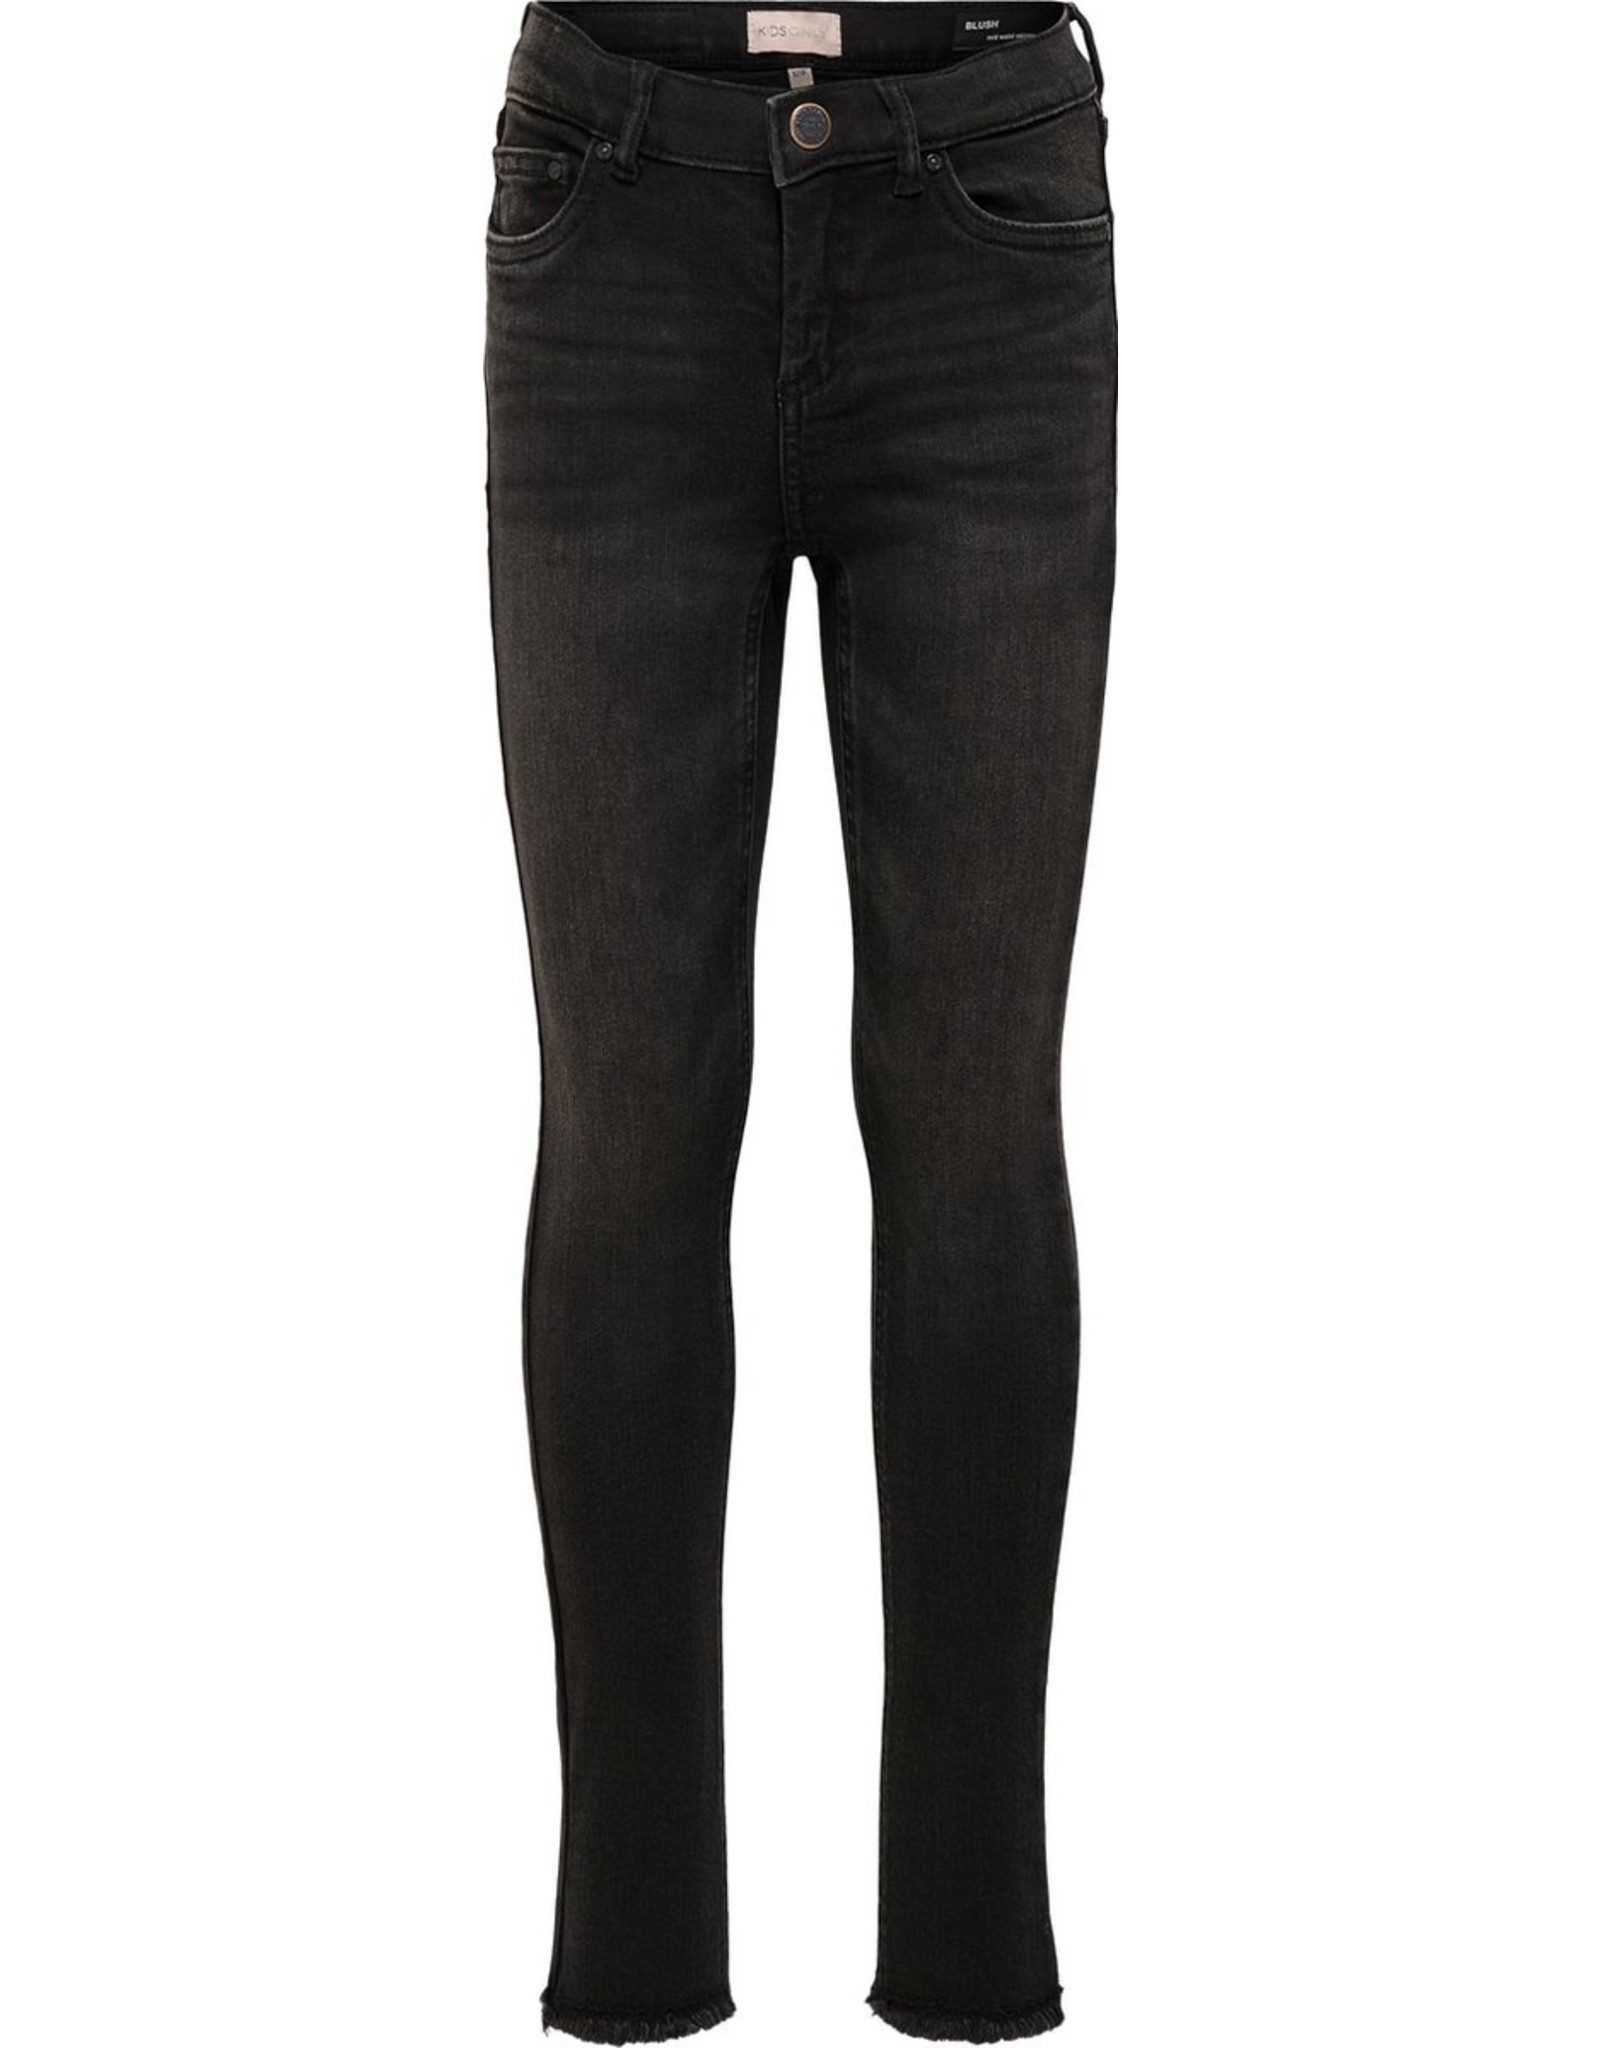 Kids Only Konblush Skinny Raw Jeans 1099 Noos Black Denim